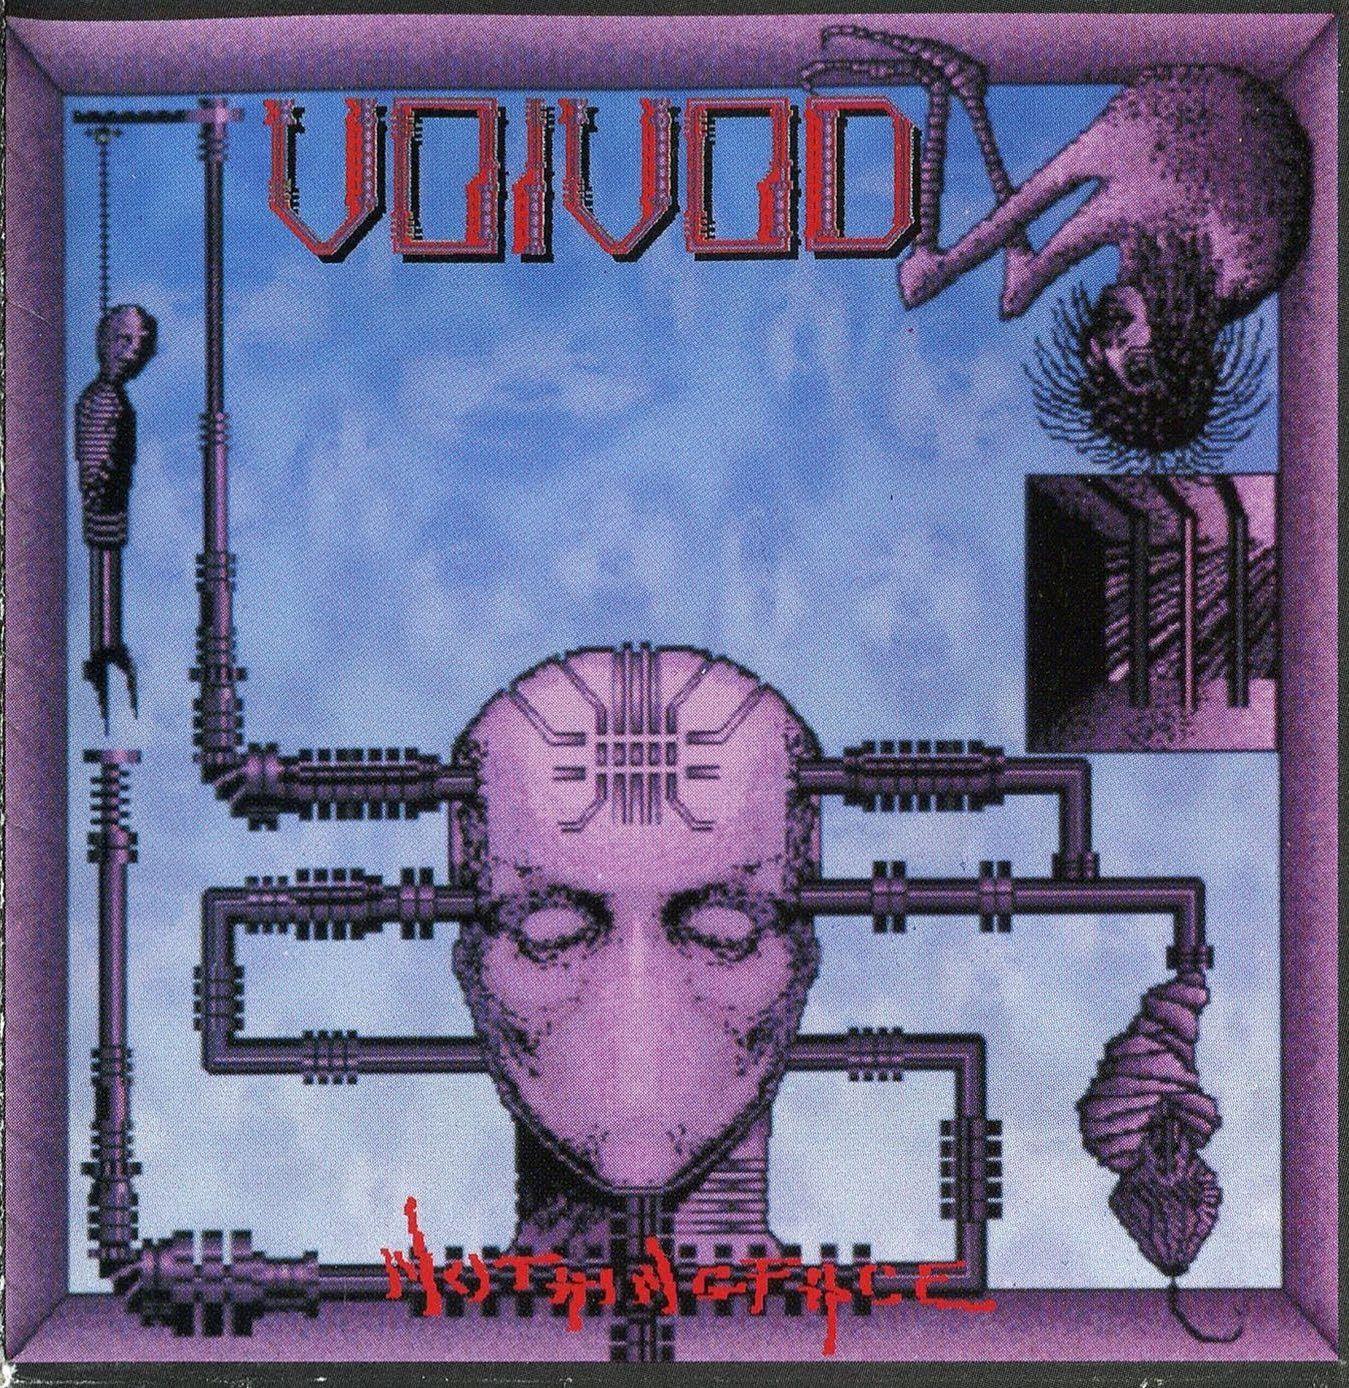 Voivod - Nothingface (1989) [Full Album, HQ, Artwork, Lyrics]